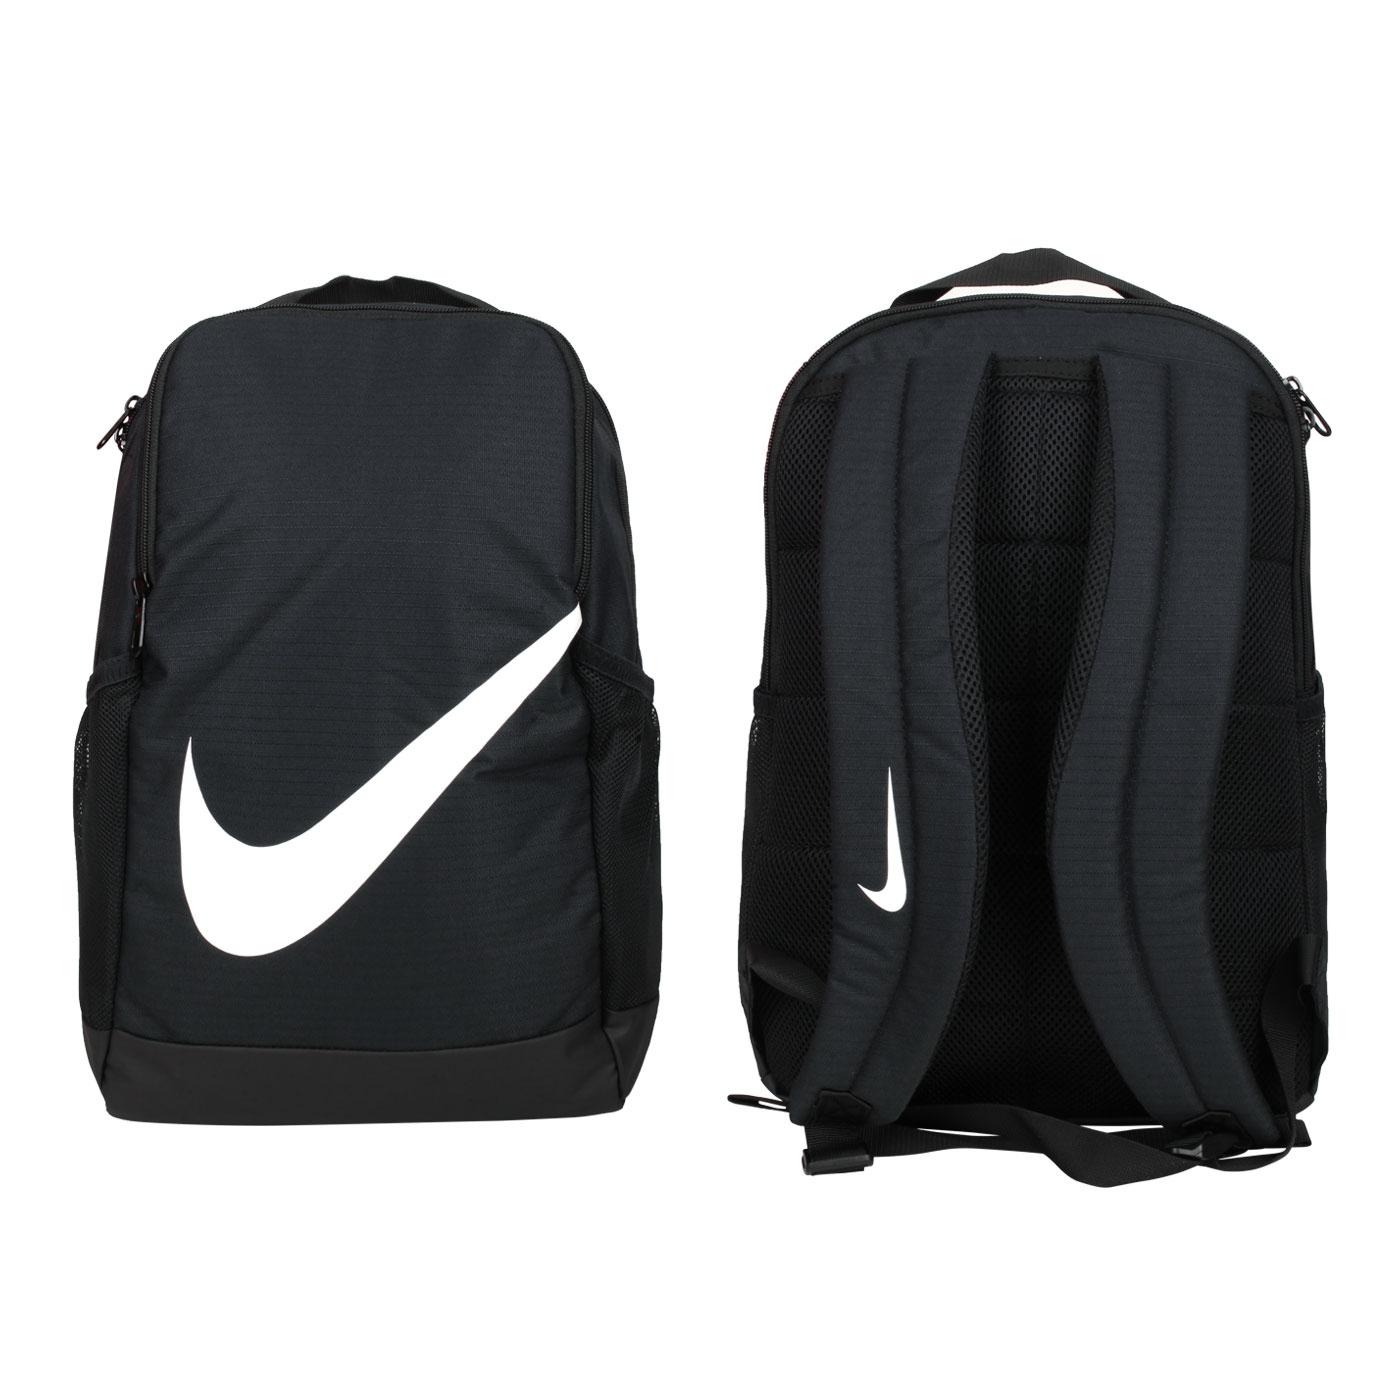 NIKE 後背包 BA6029-010 - 黑白